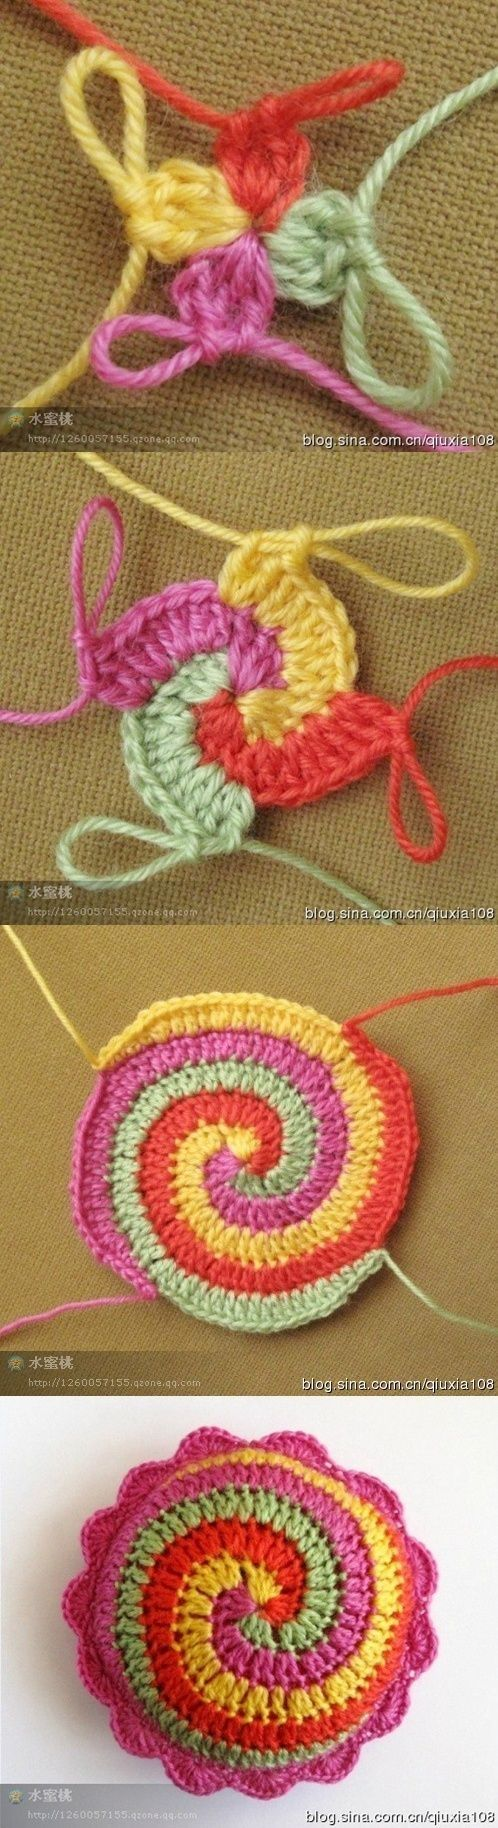 Spiral crochet by tiquis-miquis